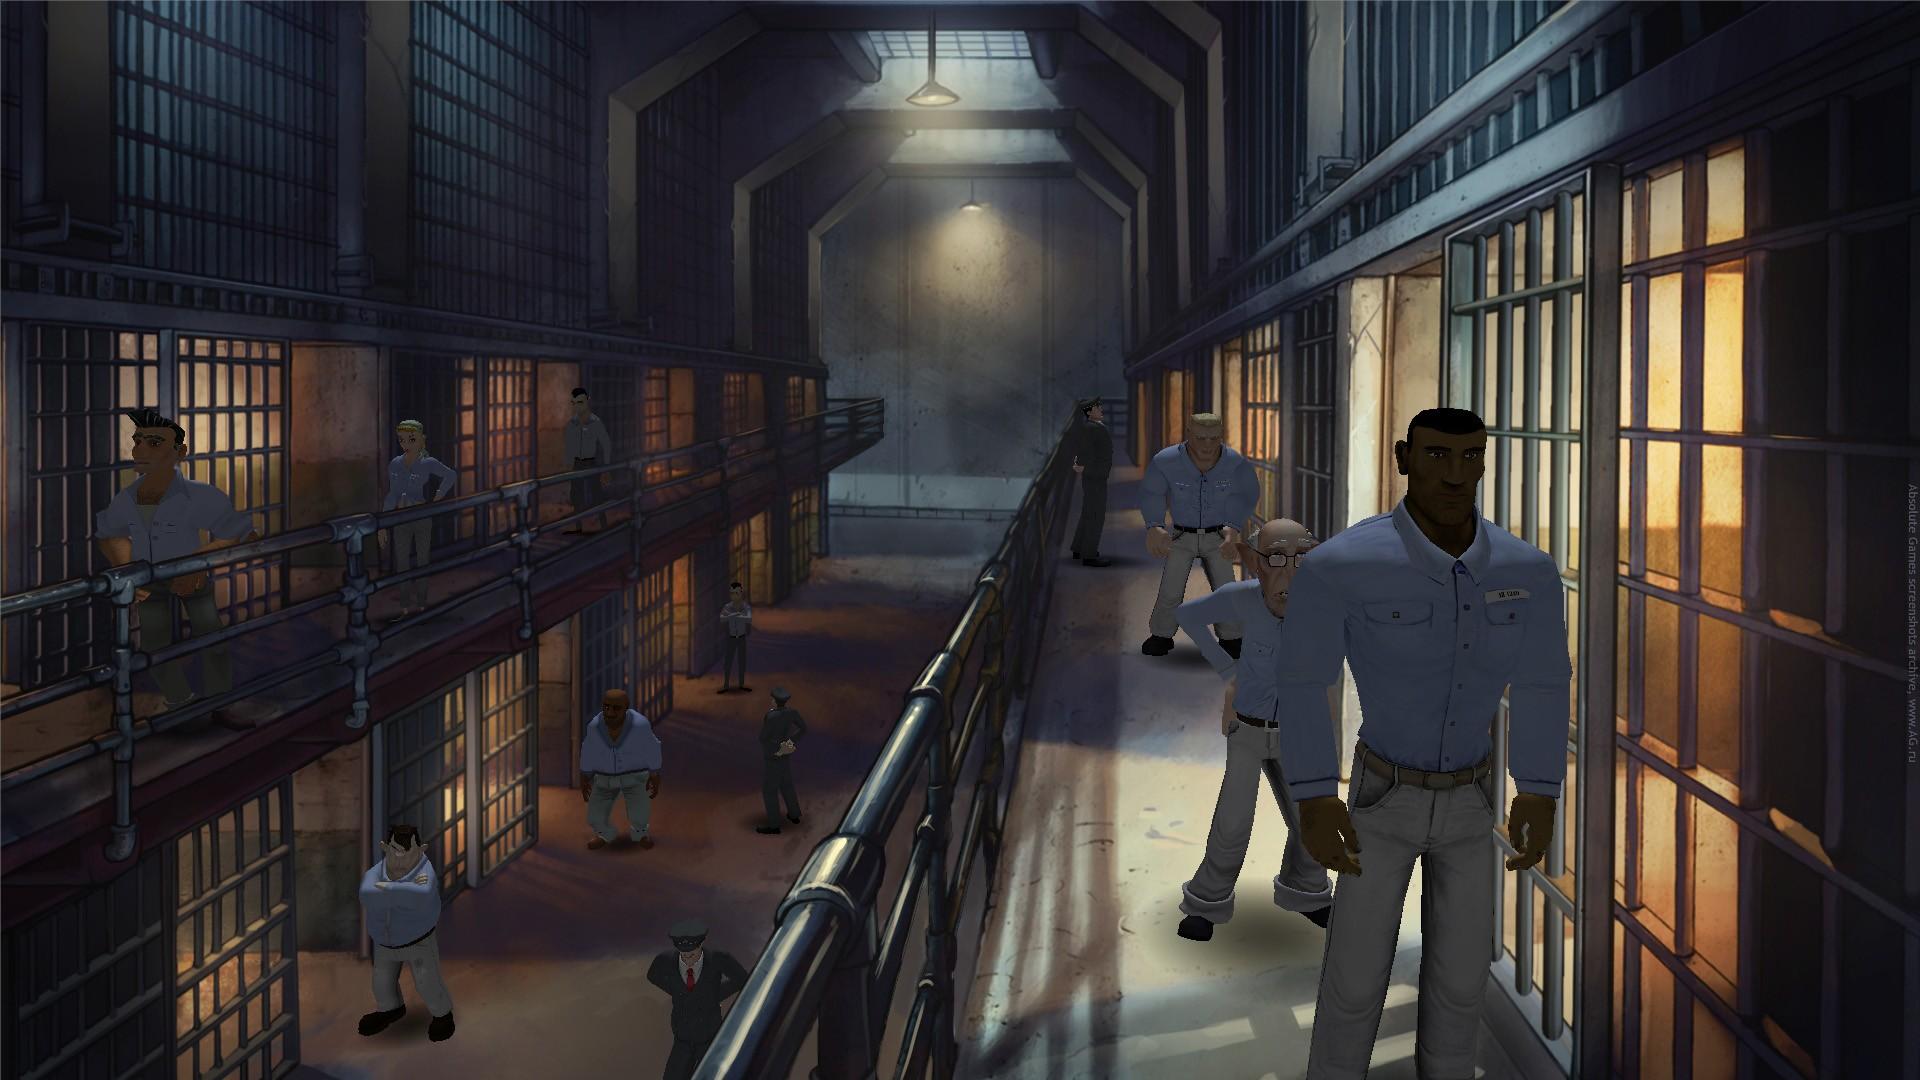 Game 1 ru флеш игра Побег из Тюрьмы онлайн